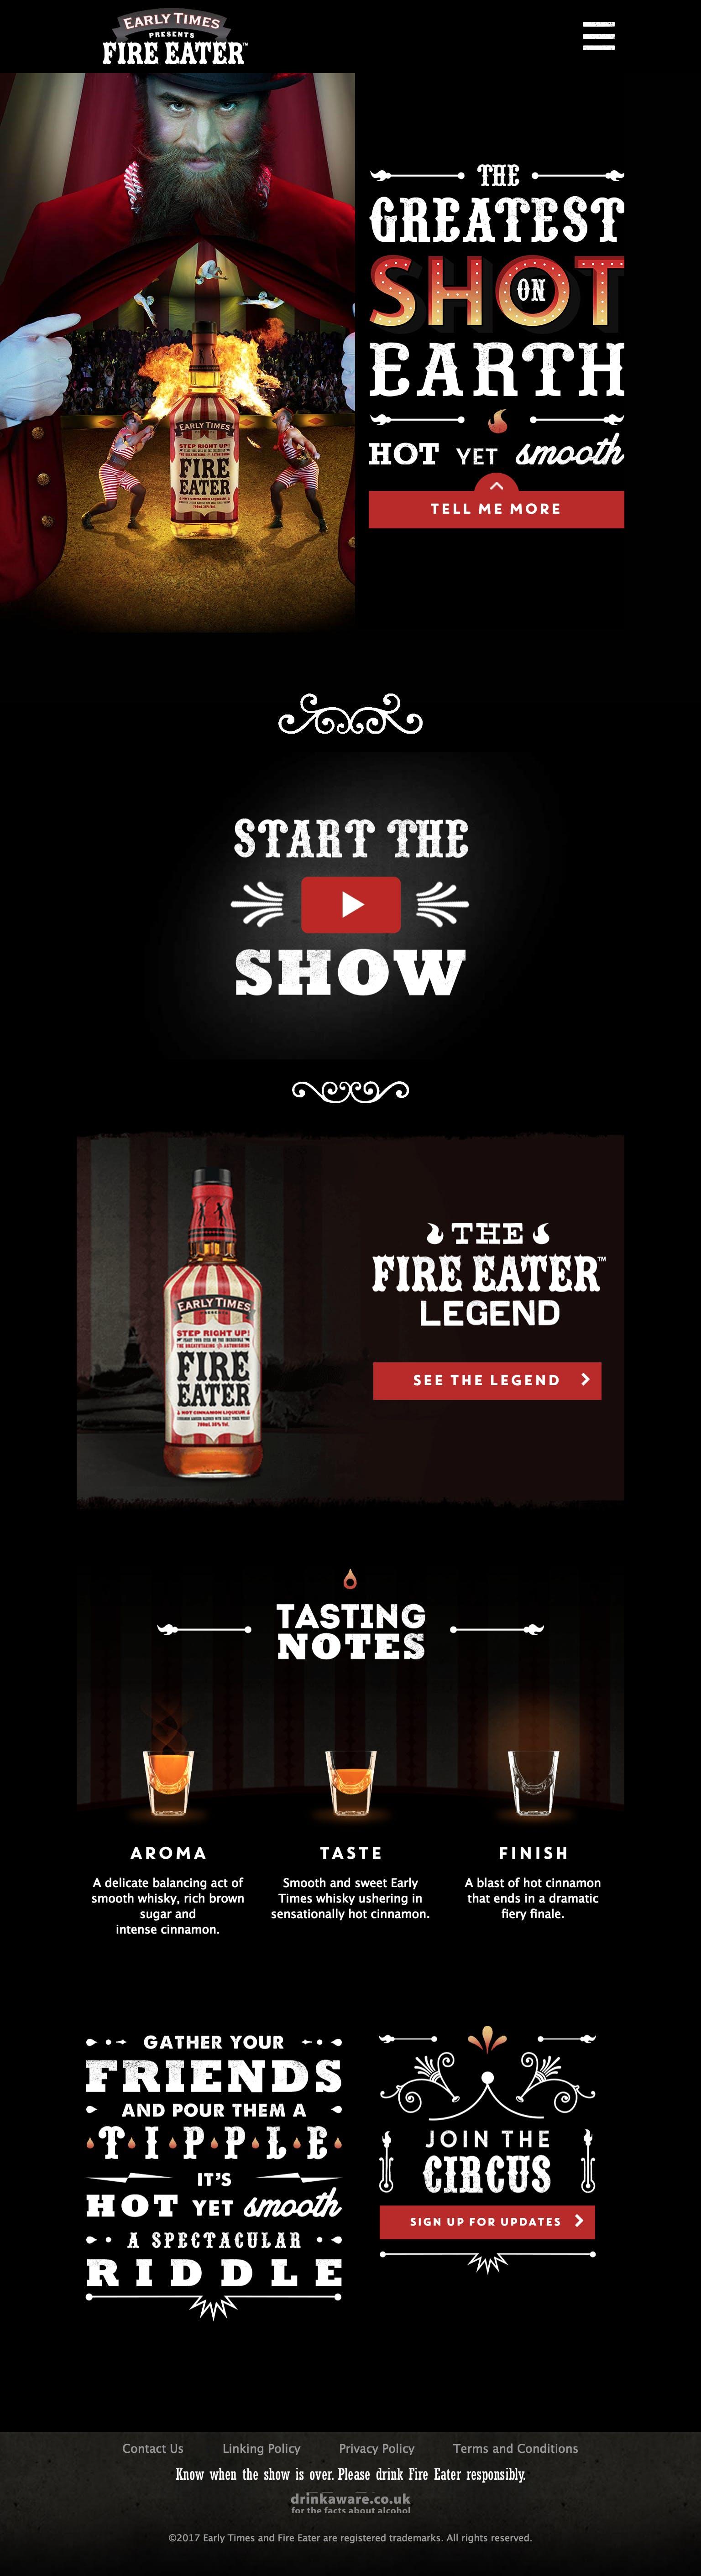 Fire Eater 768